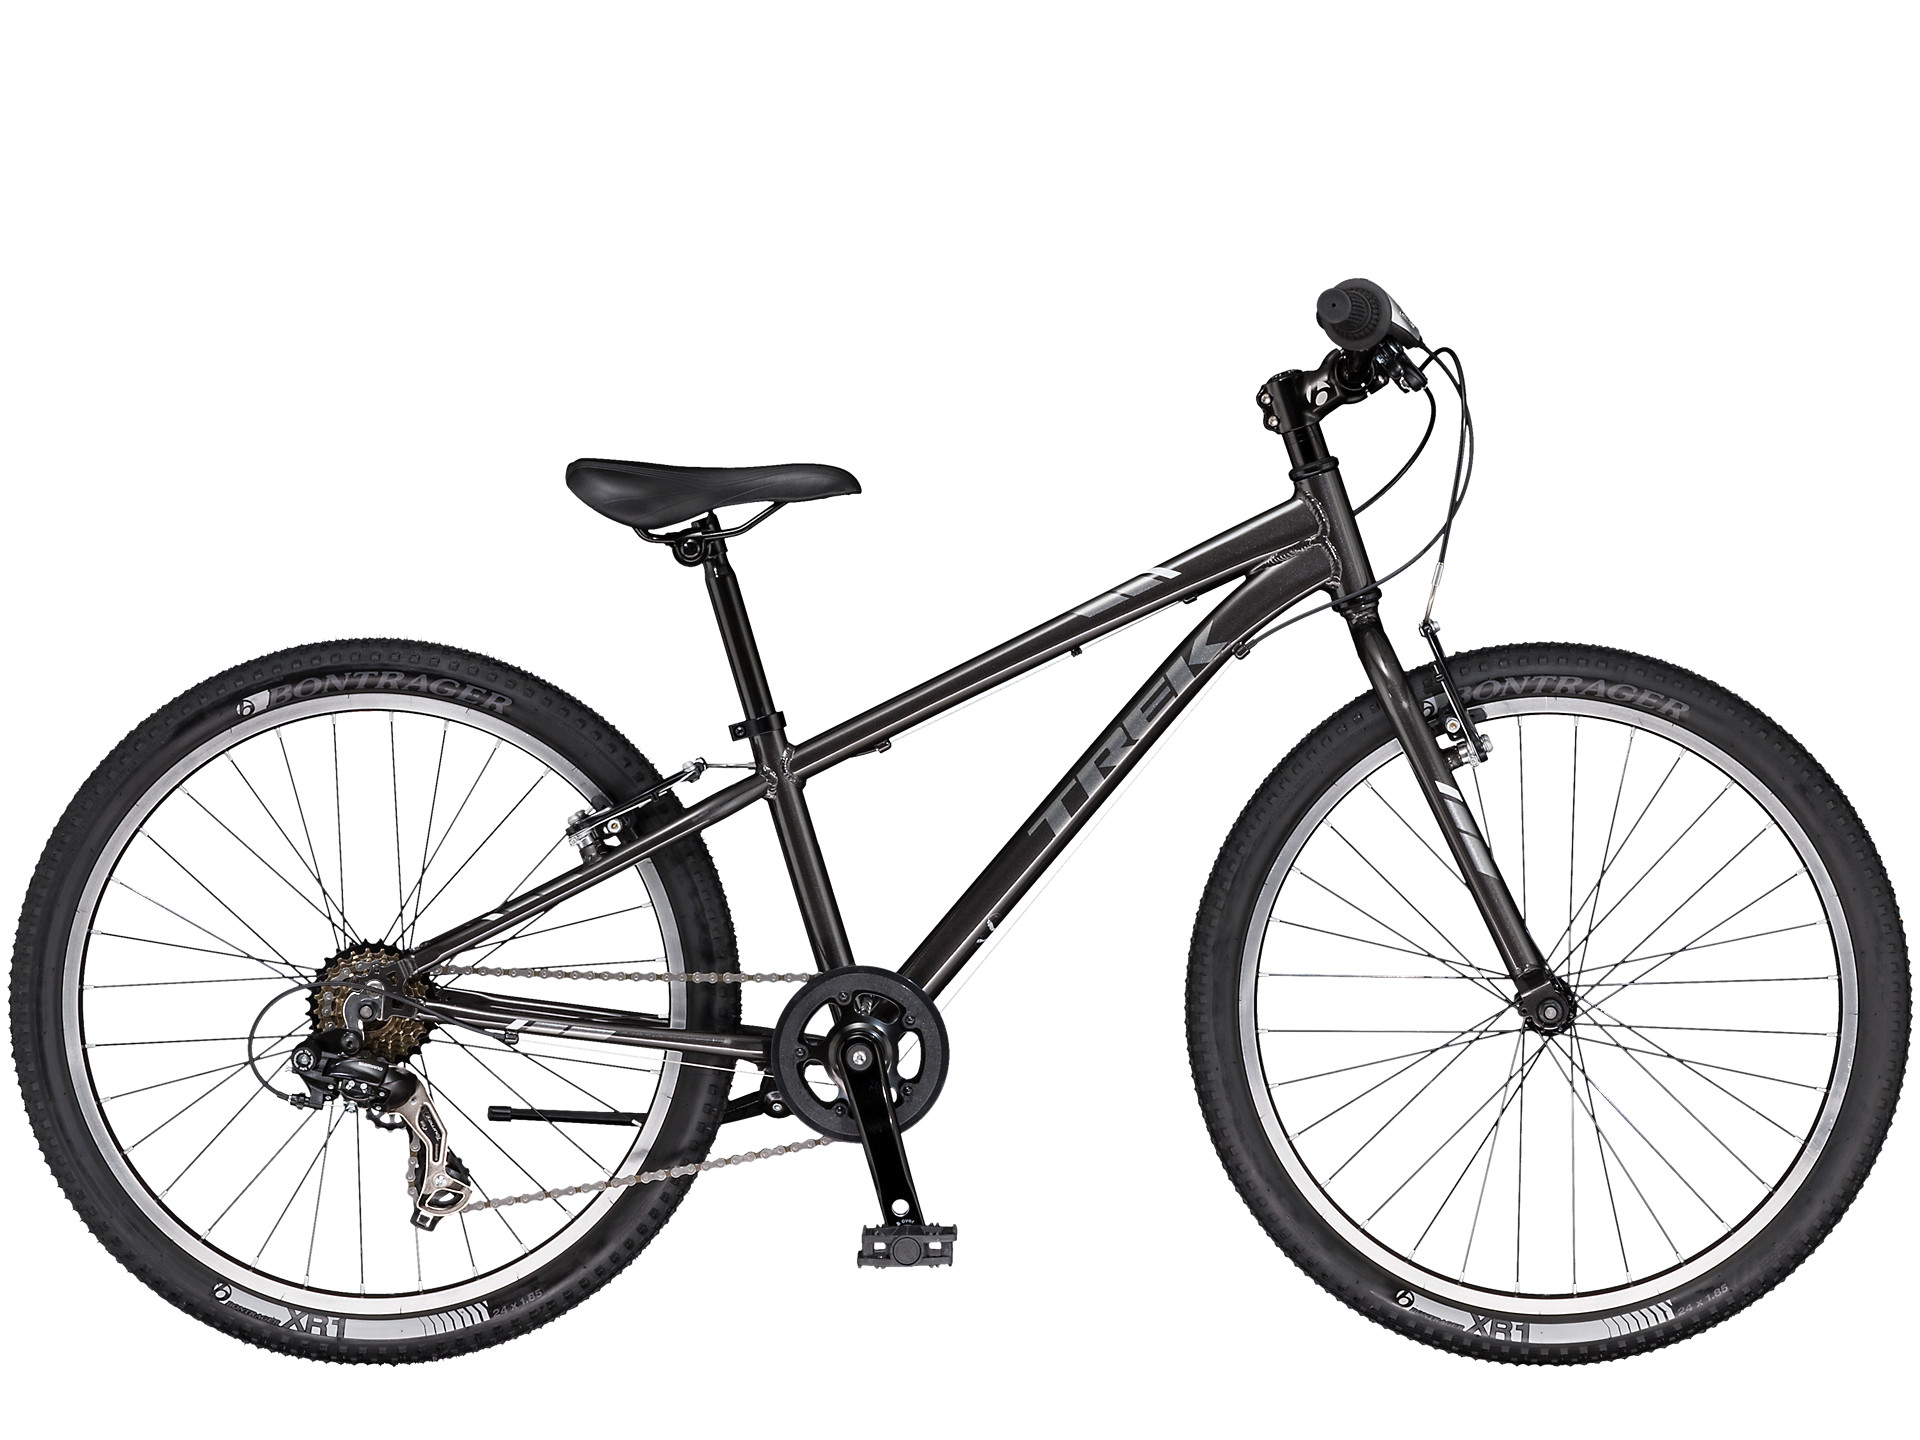 c6e1d88f89a Precaliber 24 7-speed Boy's   Trek Bikes